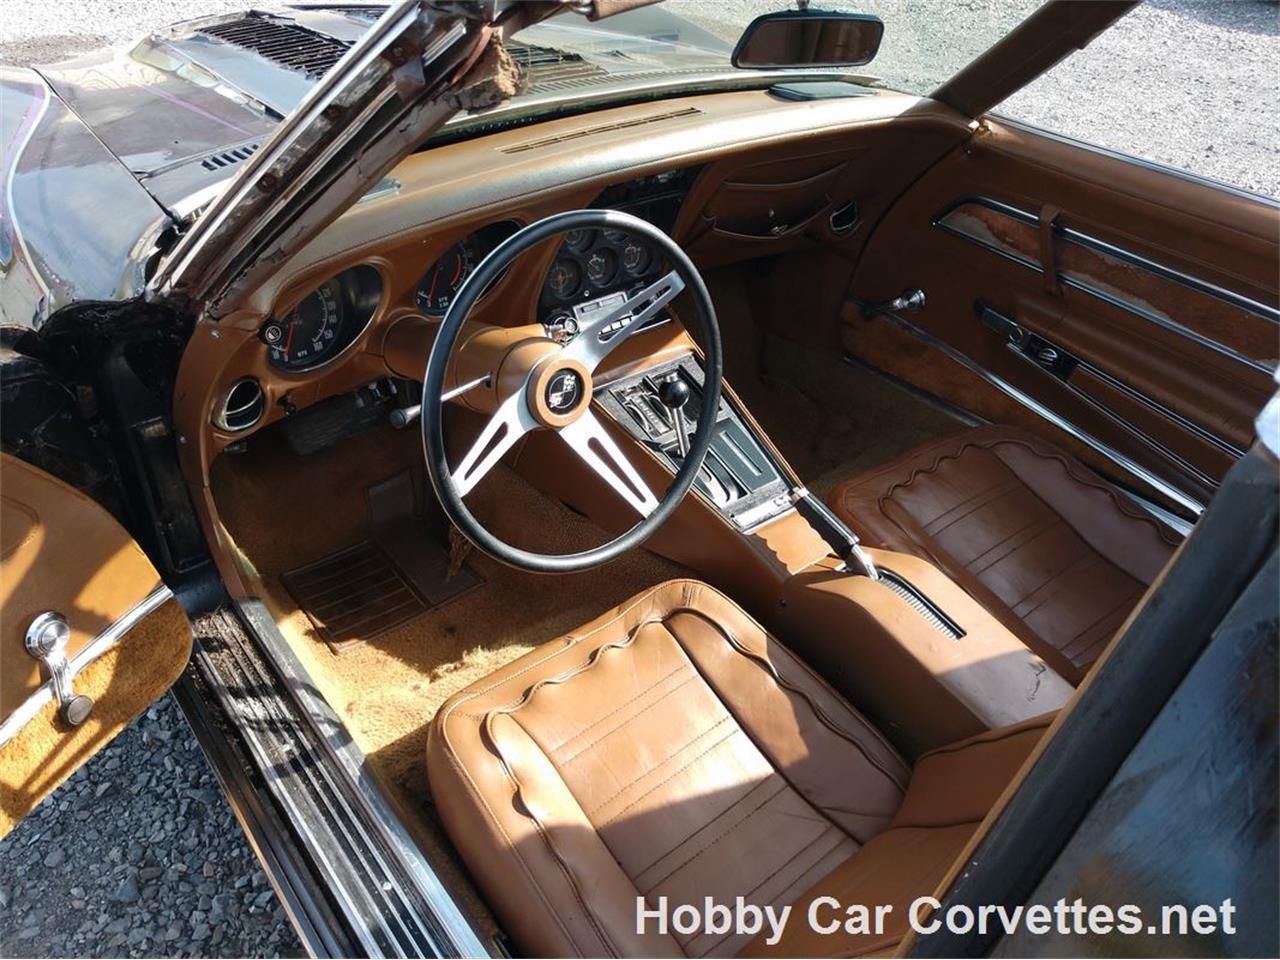 1972 Chevrolet Corvette (CC-1025060) for sale in Martinsburg, Pennsylvania